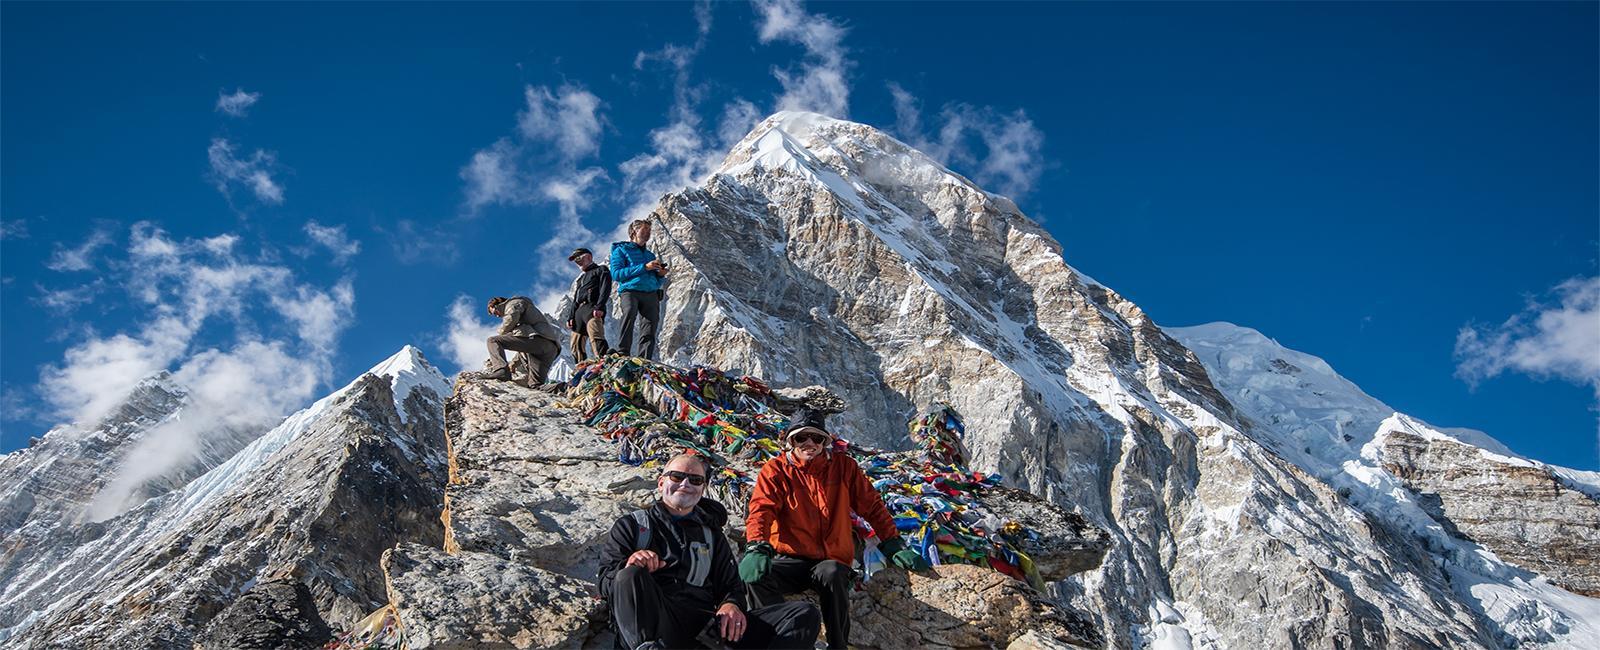 Everest kalapathar treks